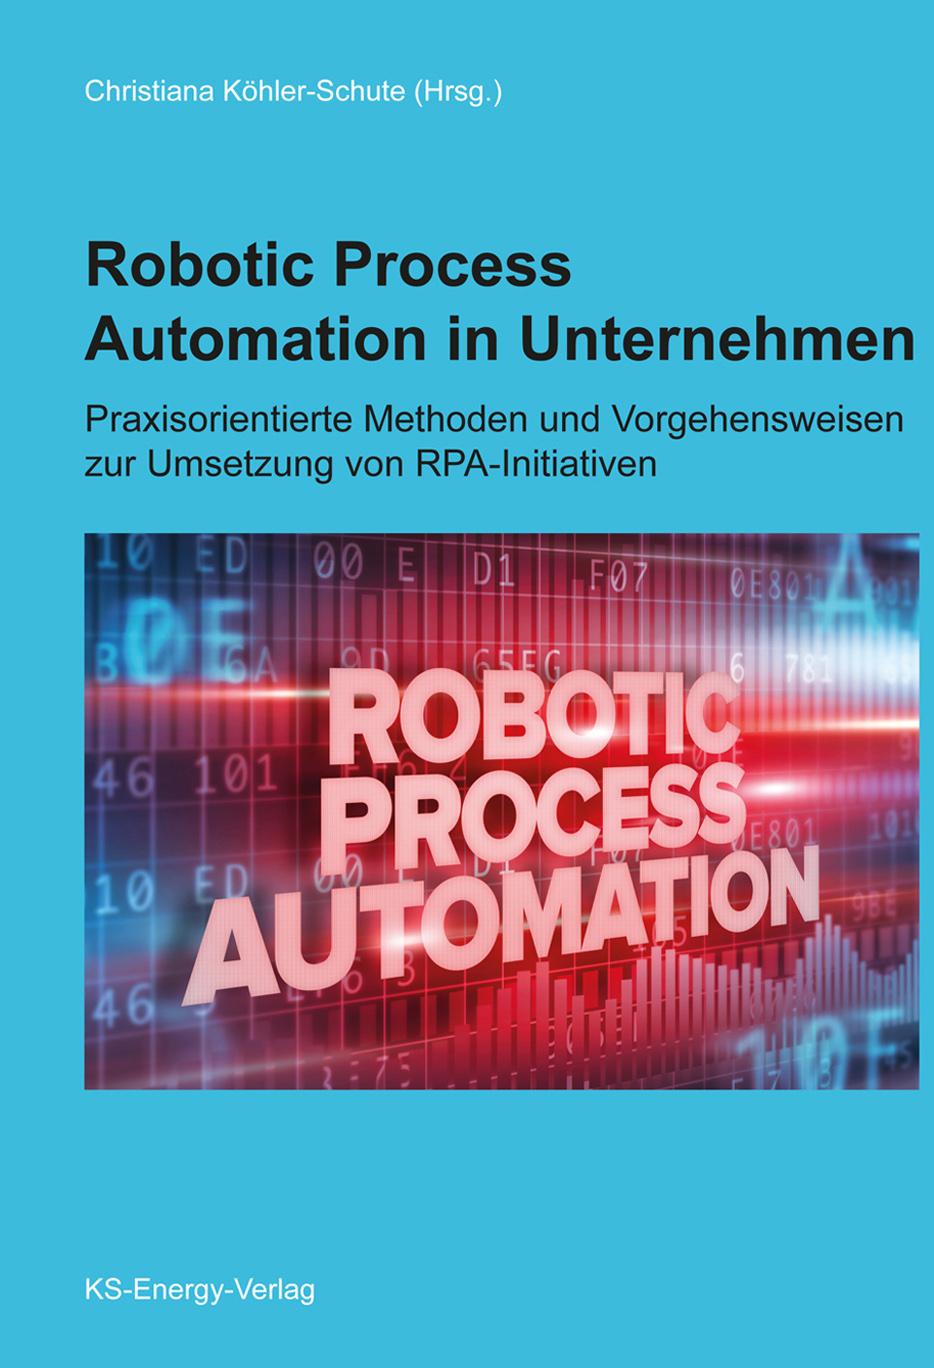 Robotic Process Automation in Unternehmen